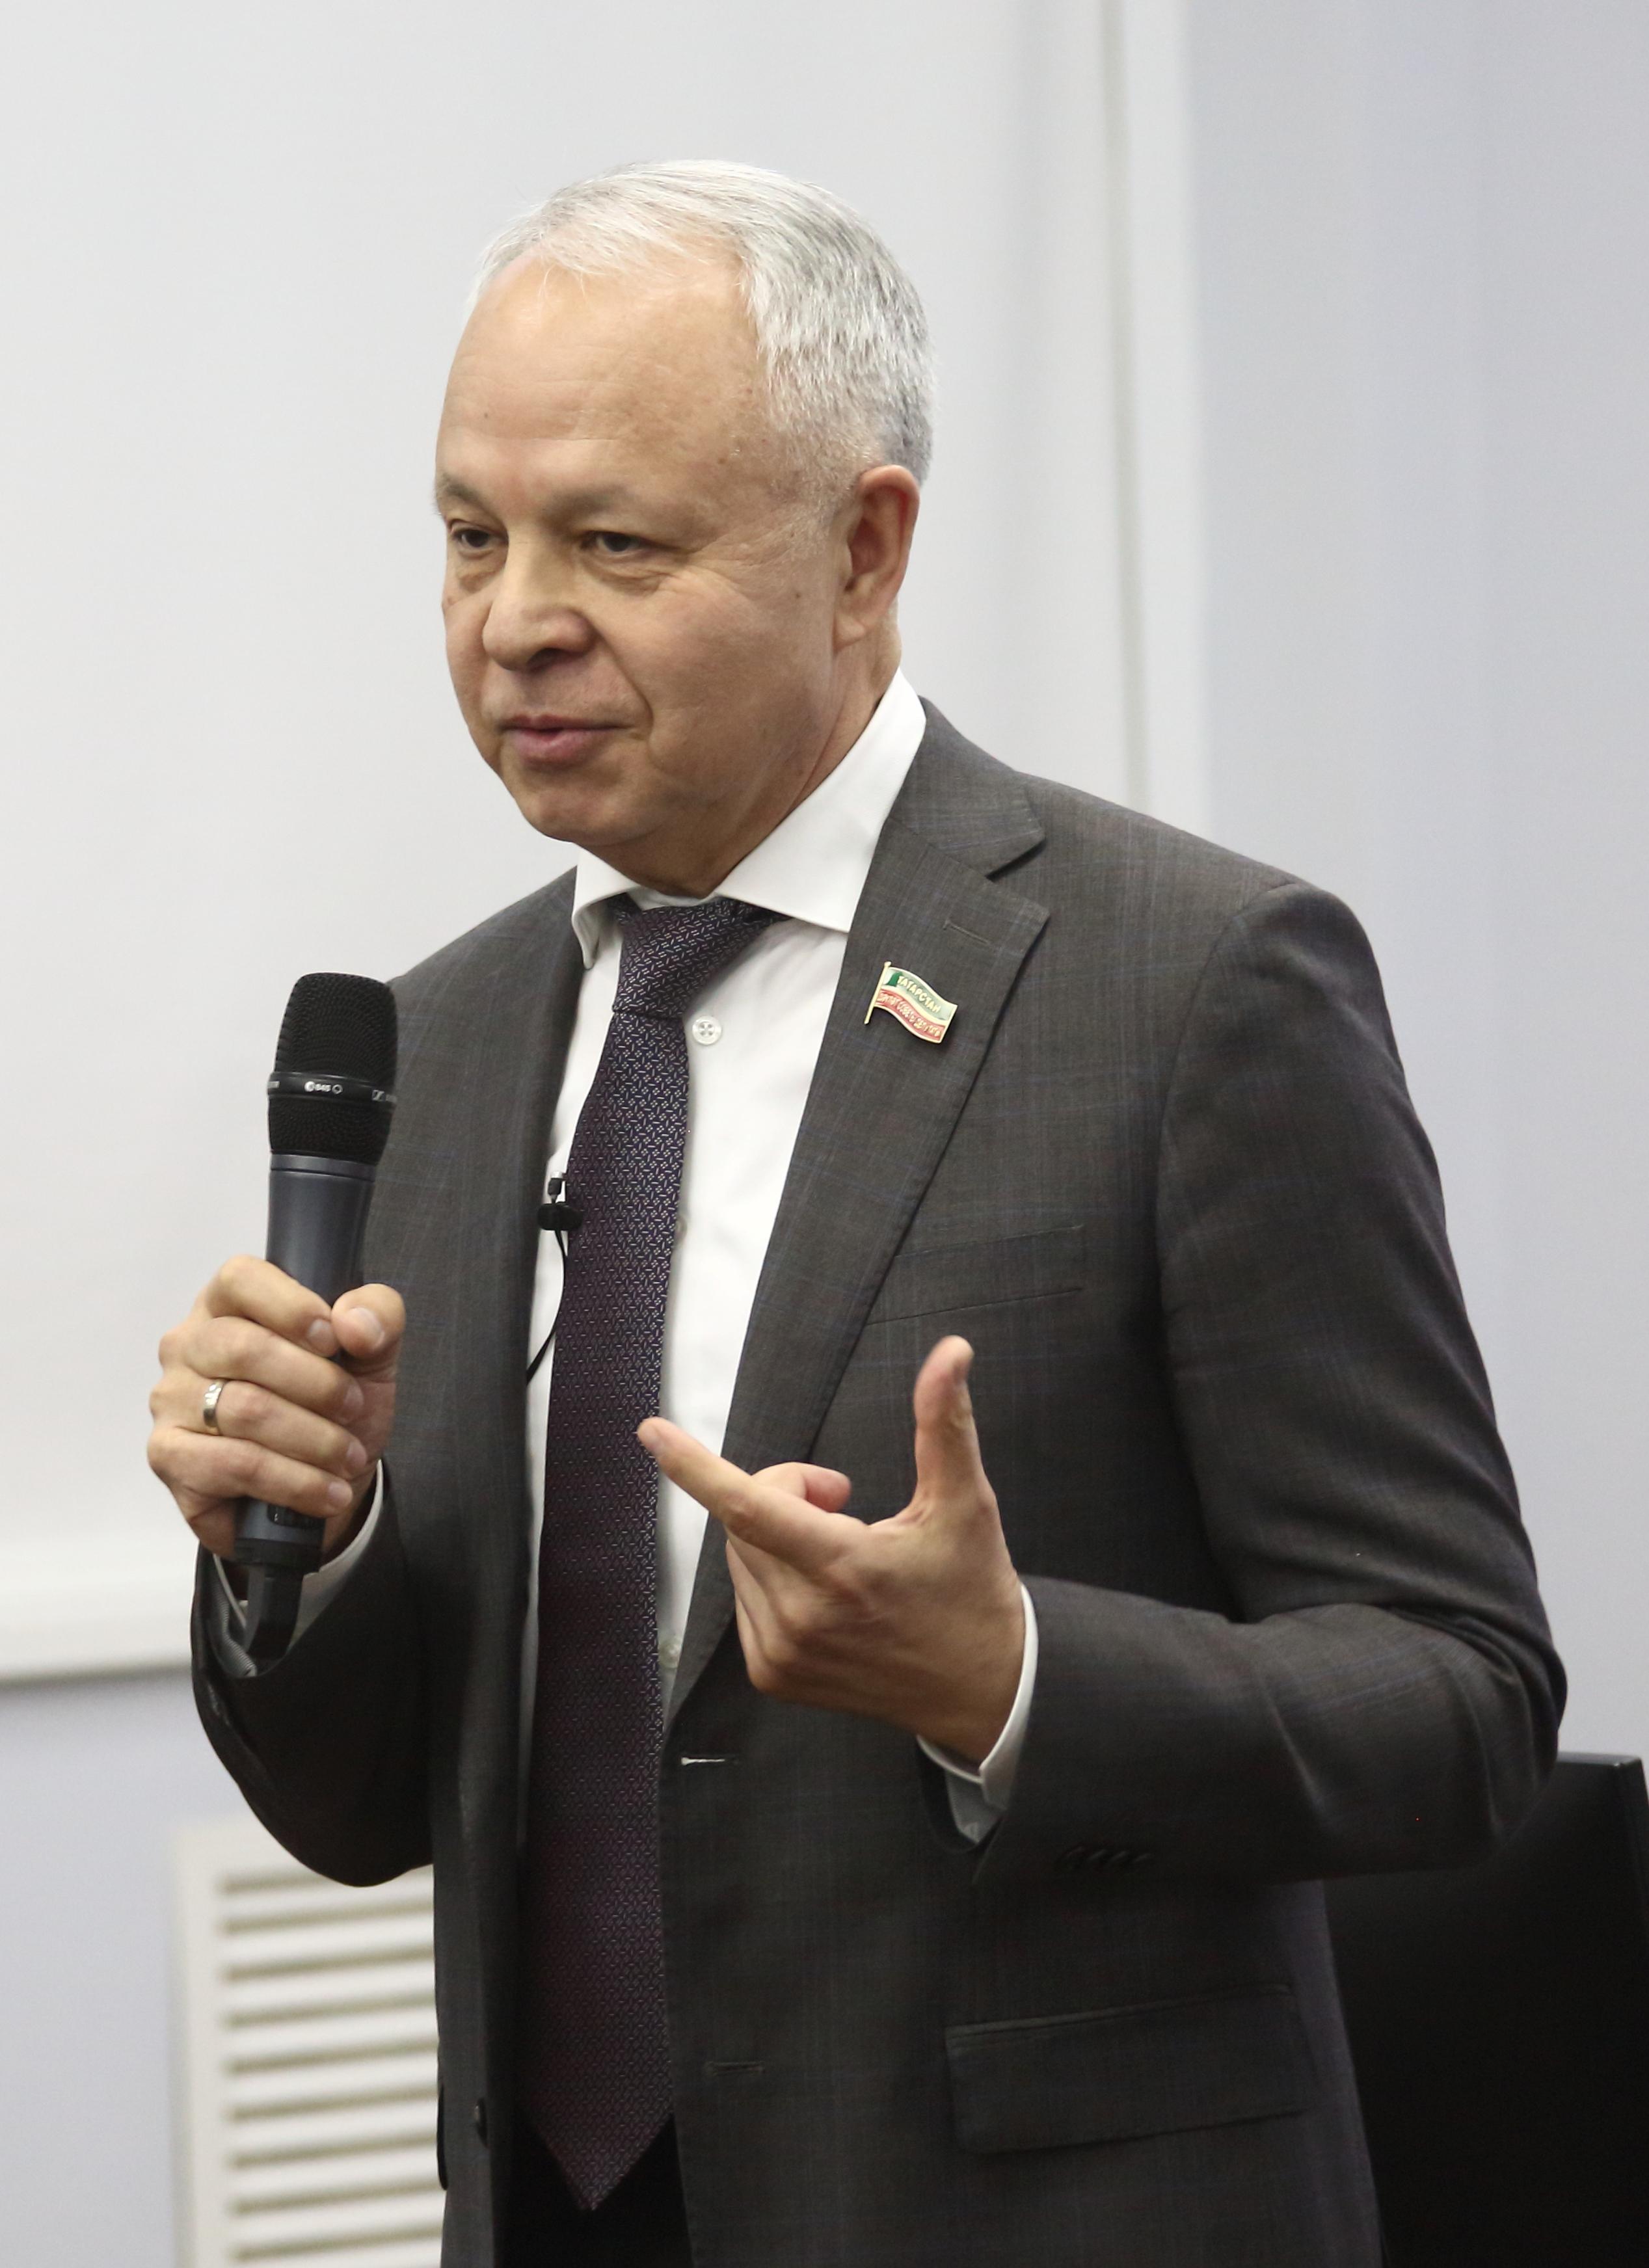 «Встречи с лидерами» для камазовского резерва руководителей